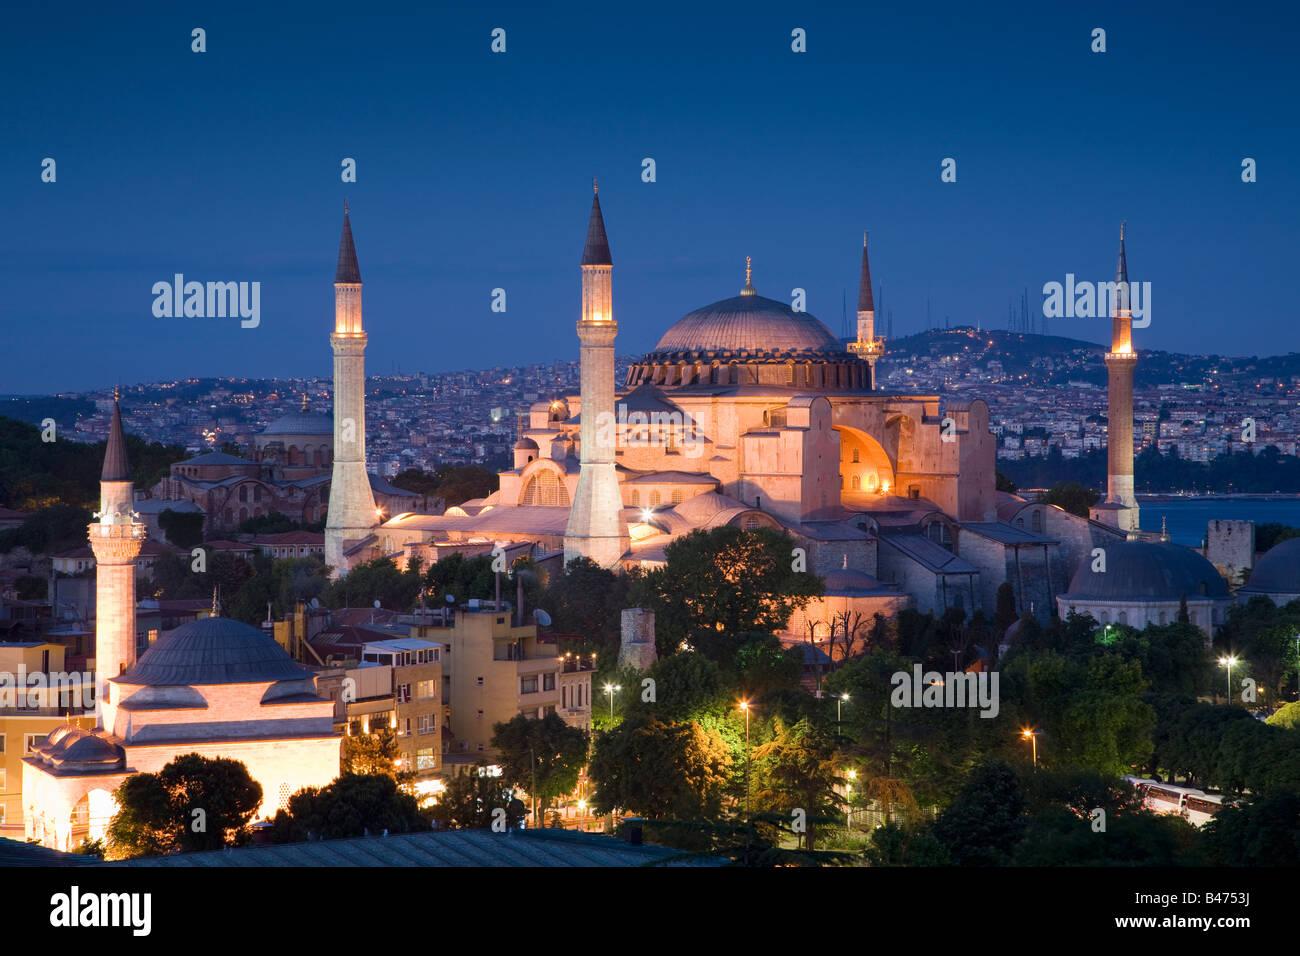 Turquia Estambul elevada vista de la mezquita de Hagia Sofía. Imagen De Stock